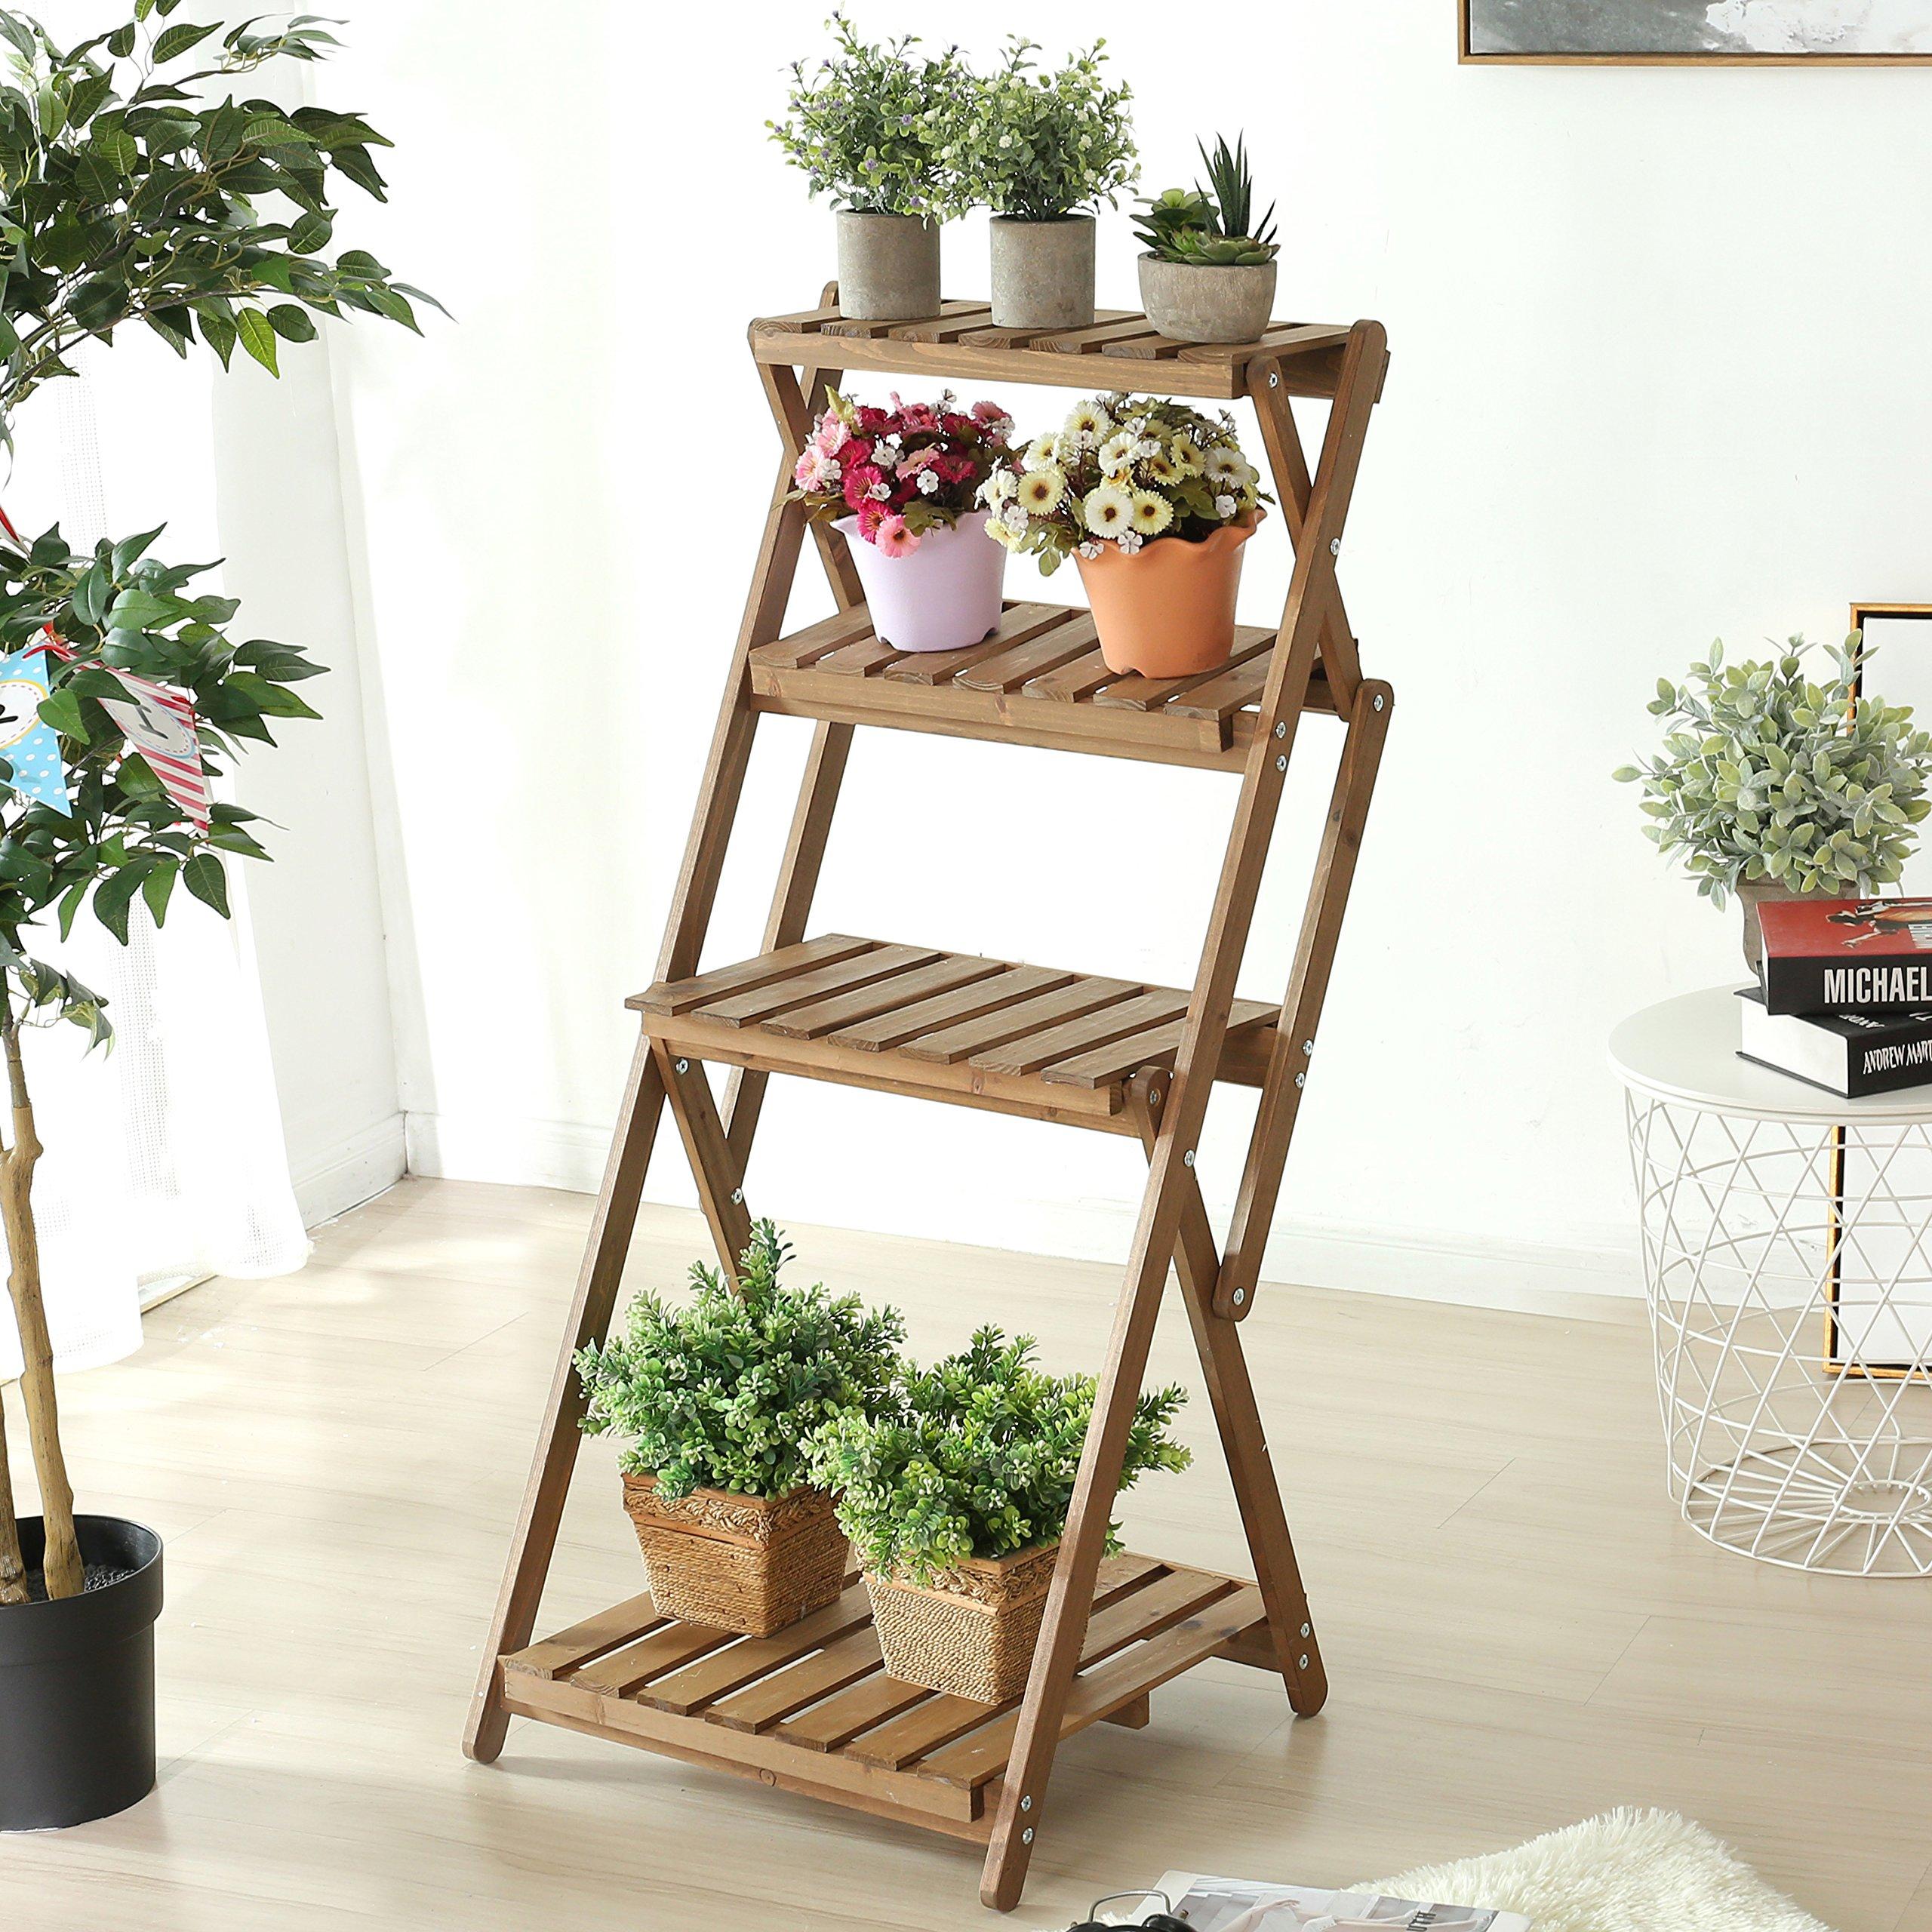 4 Tier Foldable Wood Slat Plant Rack, Decorative Indoor / Outdoor Display Shelf Stand, Brown